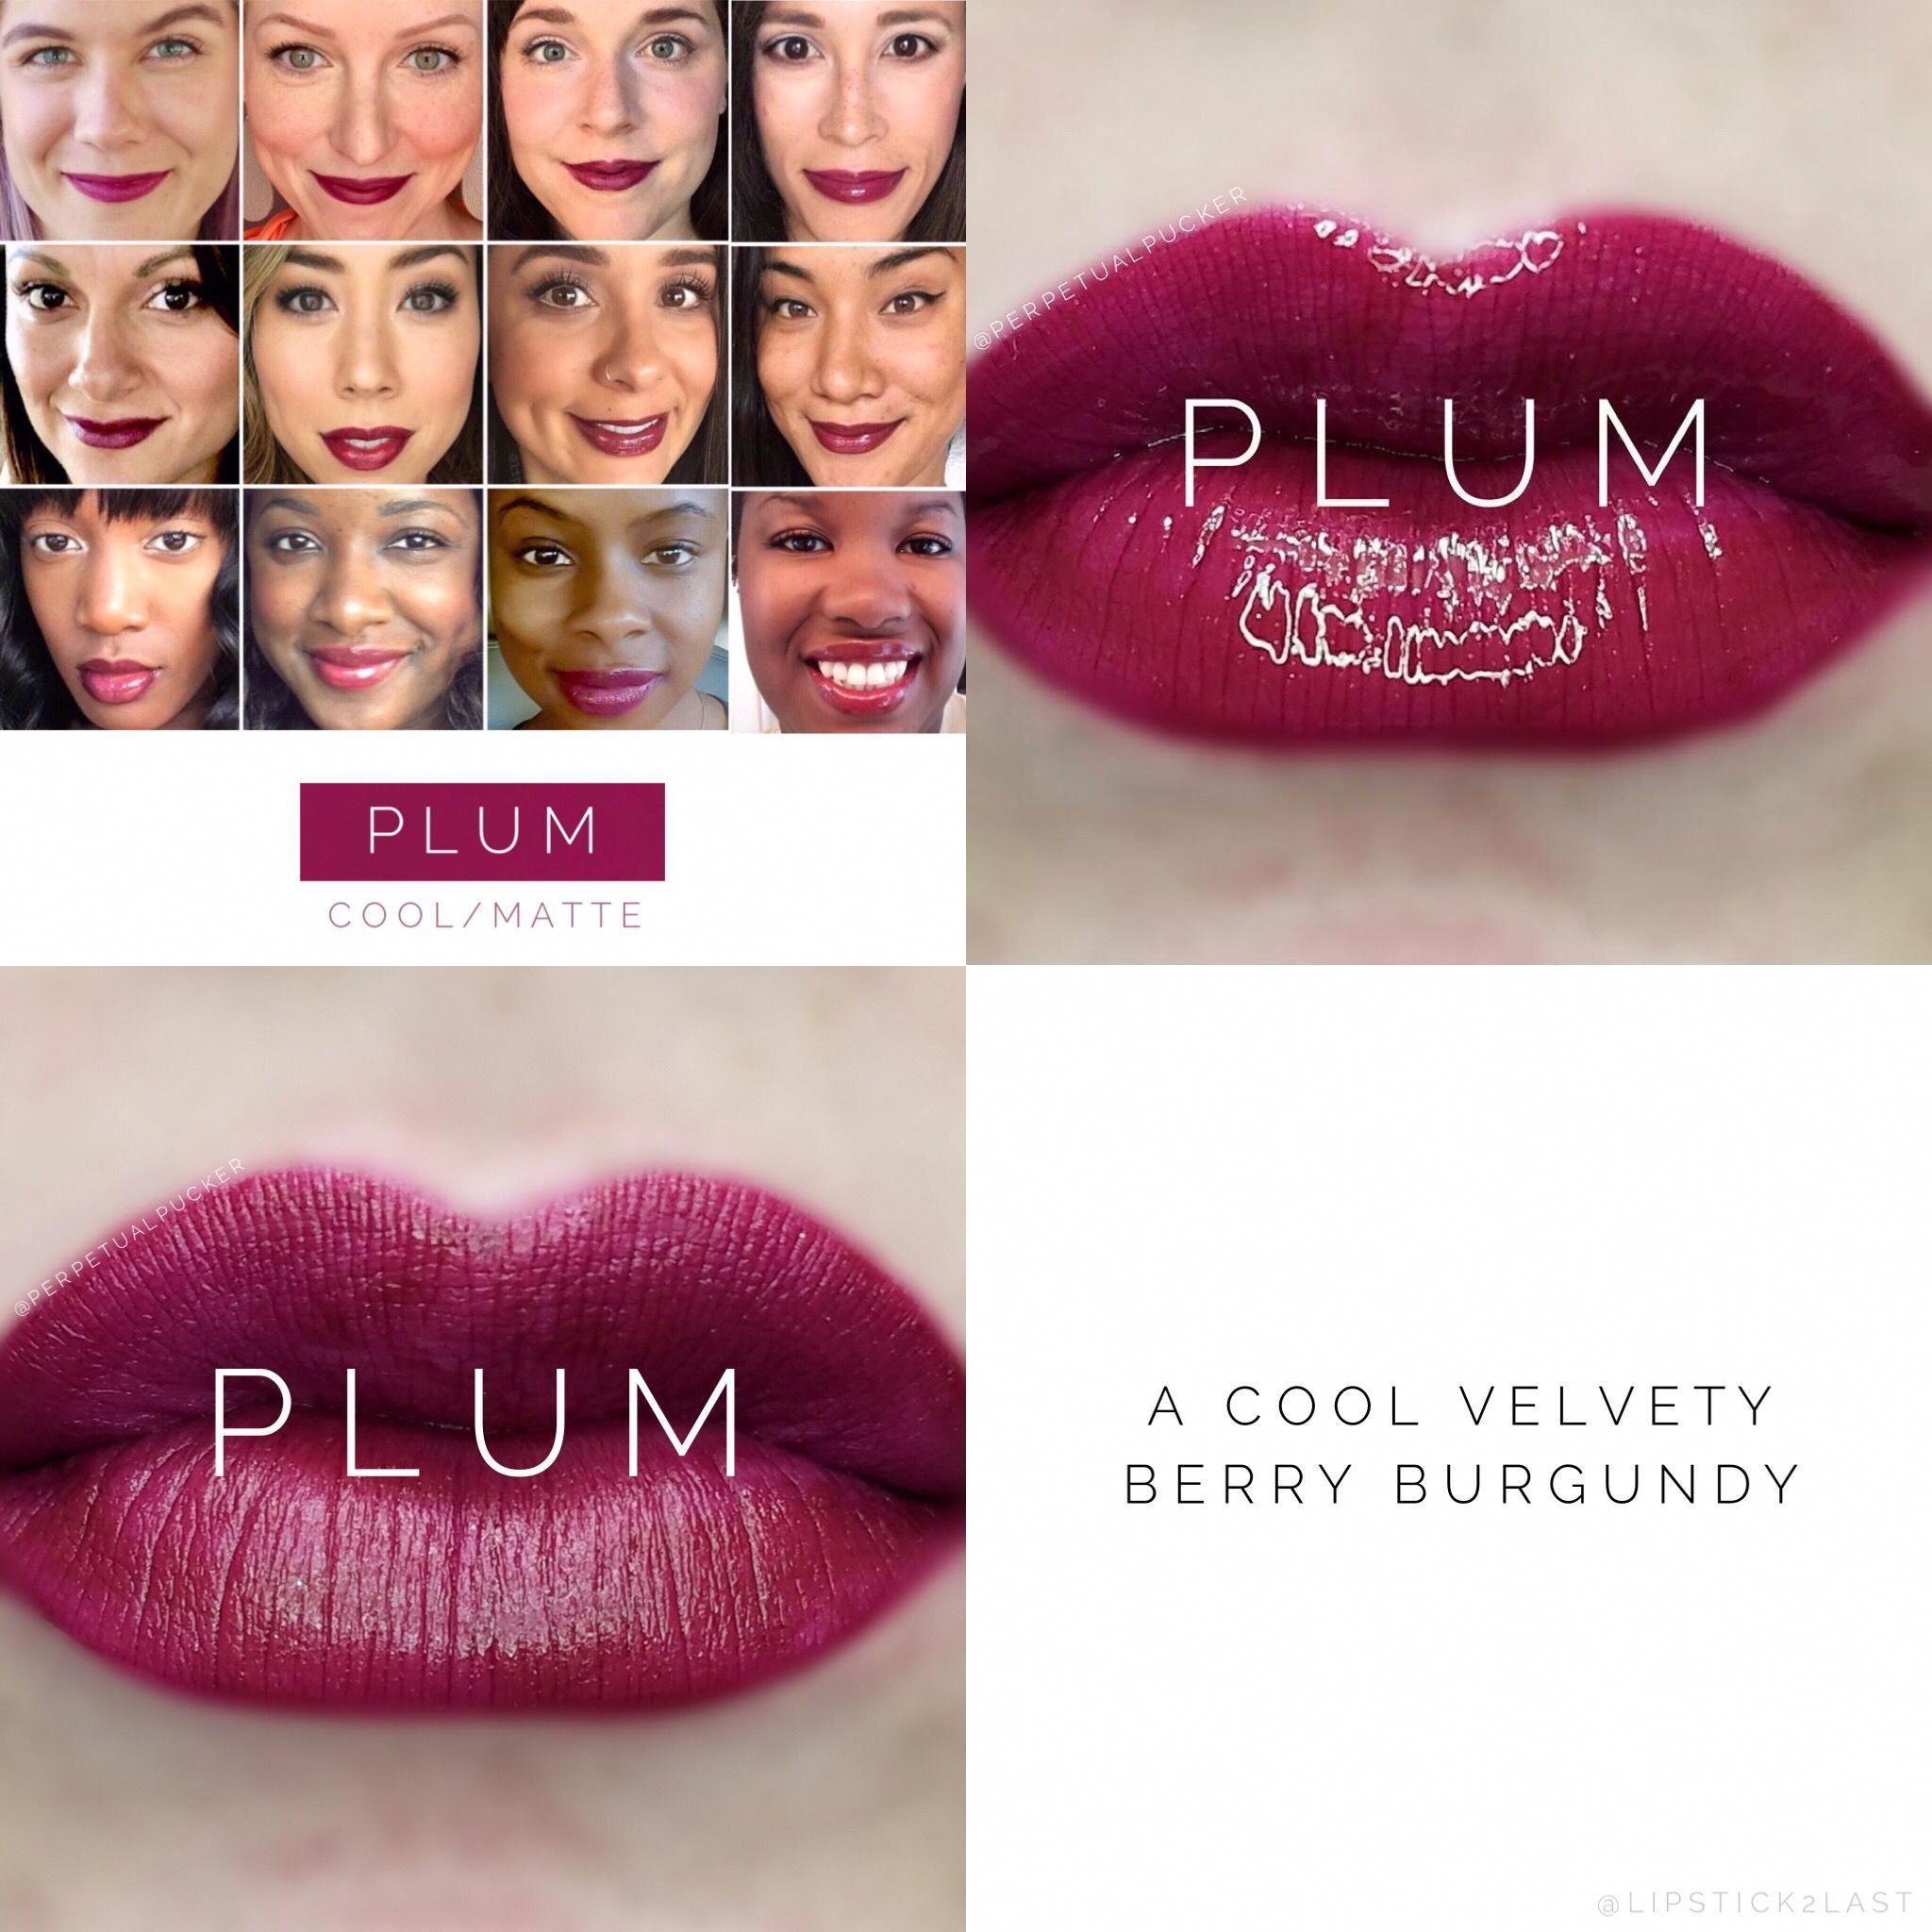 Plum LipSense of 2017. Current Plum LipSense collage #lipcolors2017